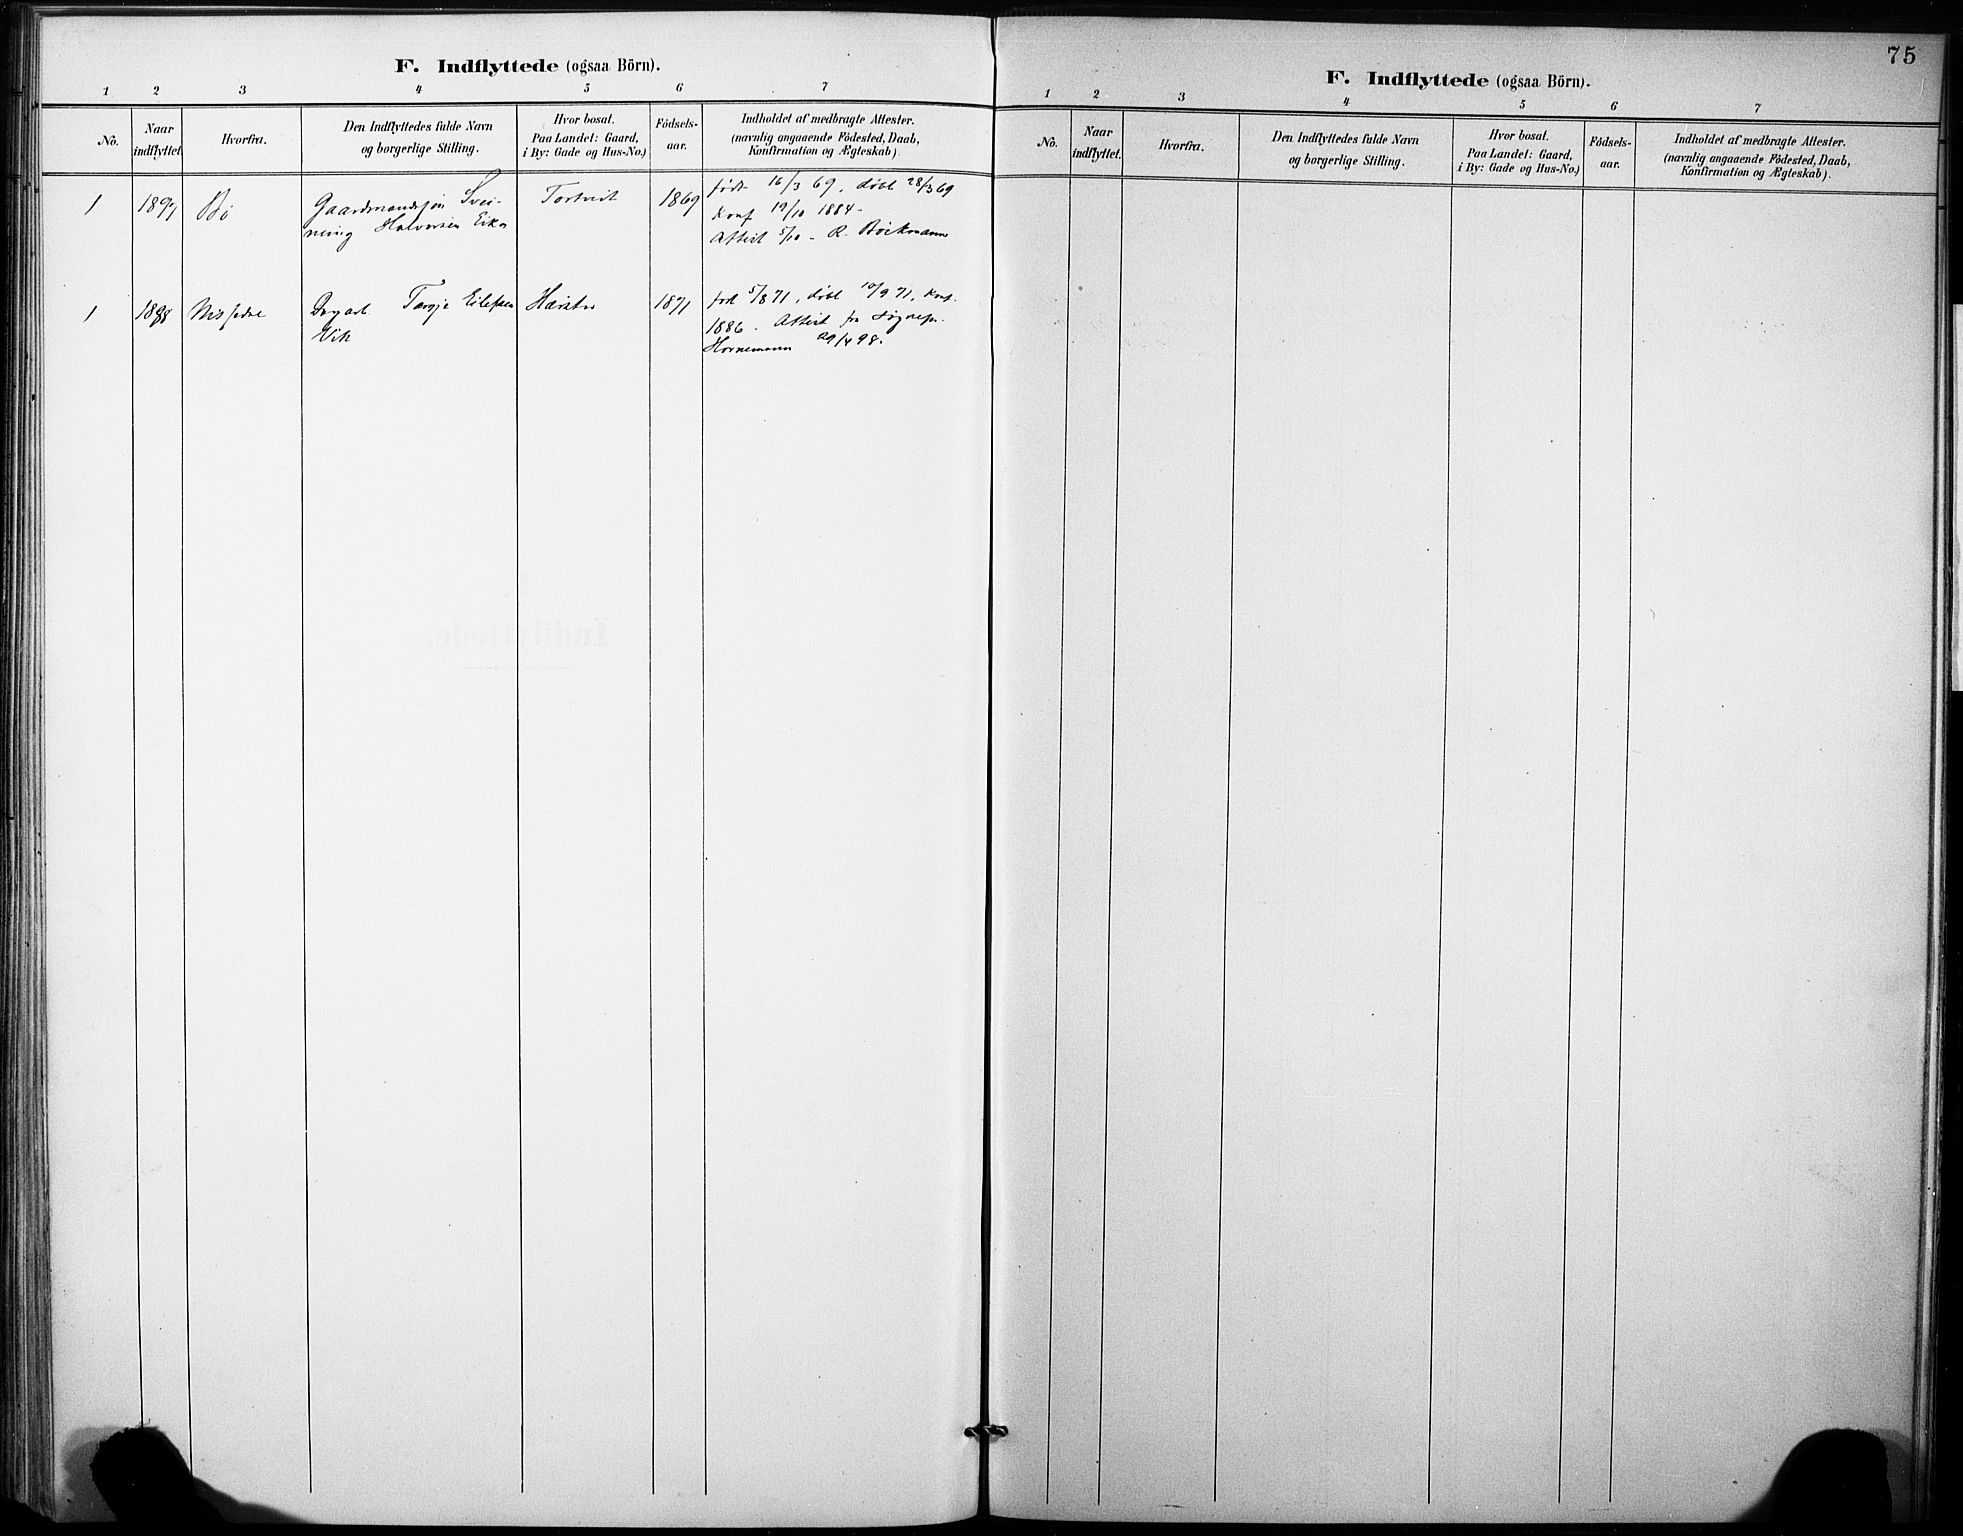 SAKO, Fyresdal kirkebøker, F/Fb/L0003: Ministerialbok nr. II 3, 1887-1903, s. 75